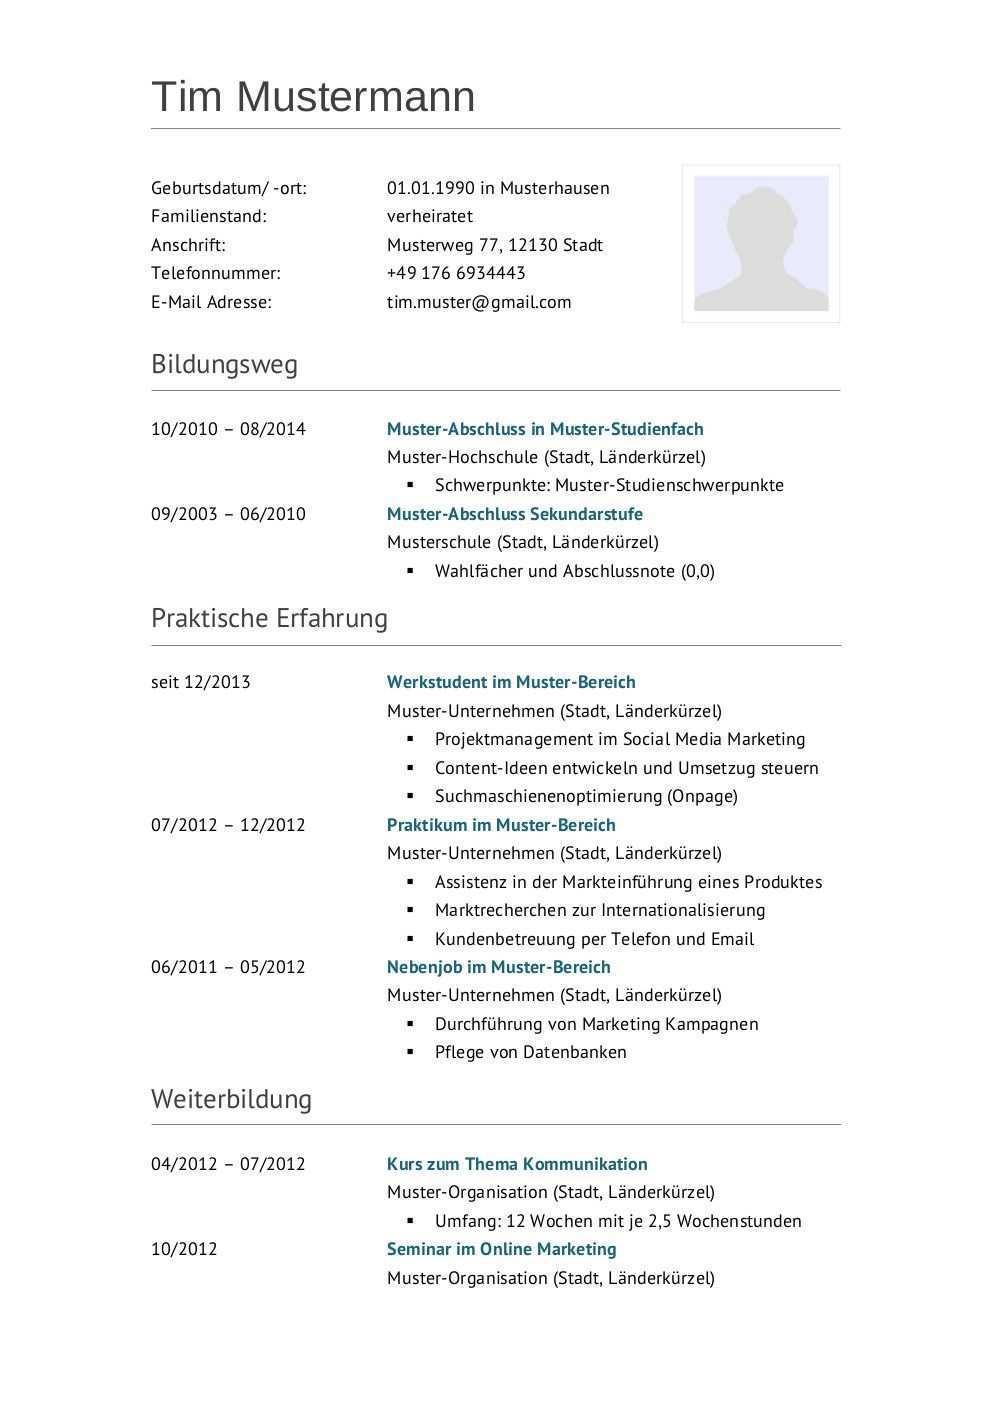 Bewerbungsmuster Techniker Lebenslauf Designs Bewerbung Techniker Lebenslauf Muster Vorlagen Bewerbun In 2020 Document Templates Resume Template Free Resume Template